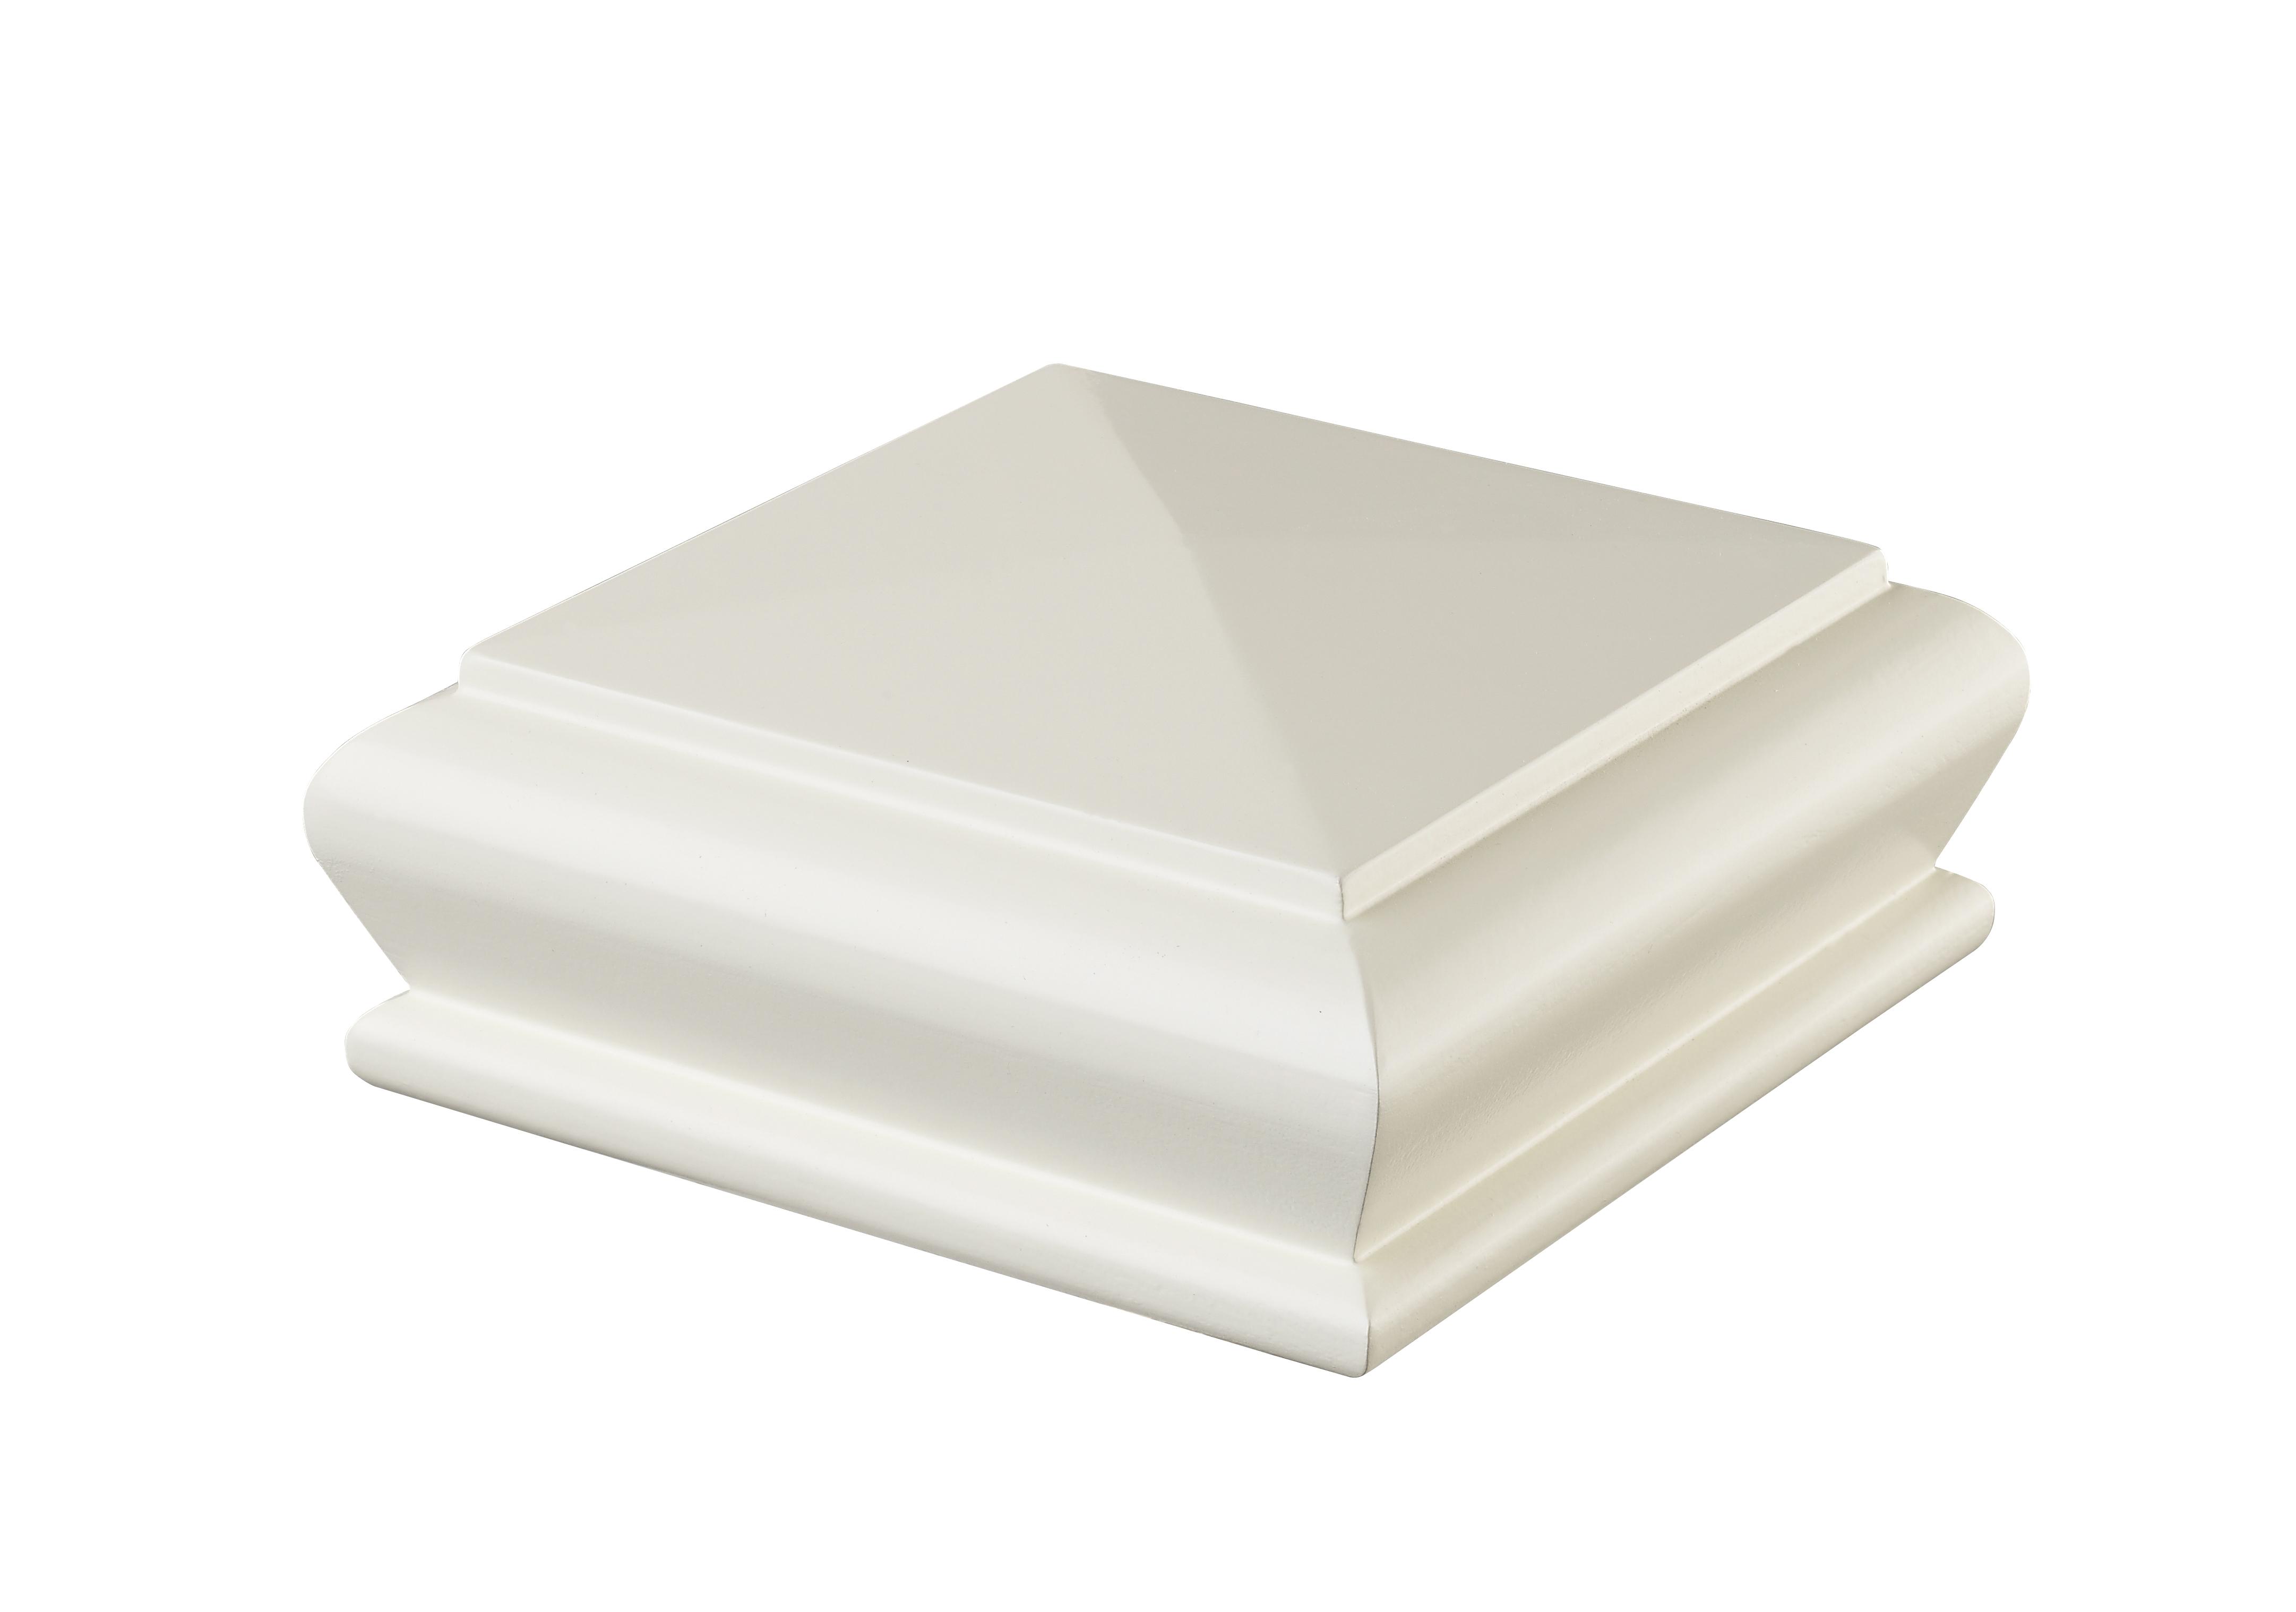 1 White Pyramid Cap 90